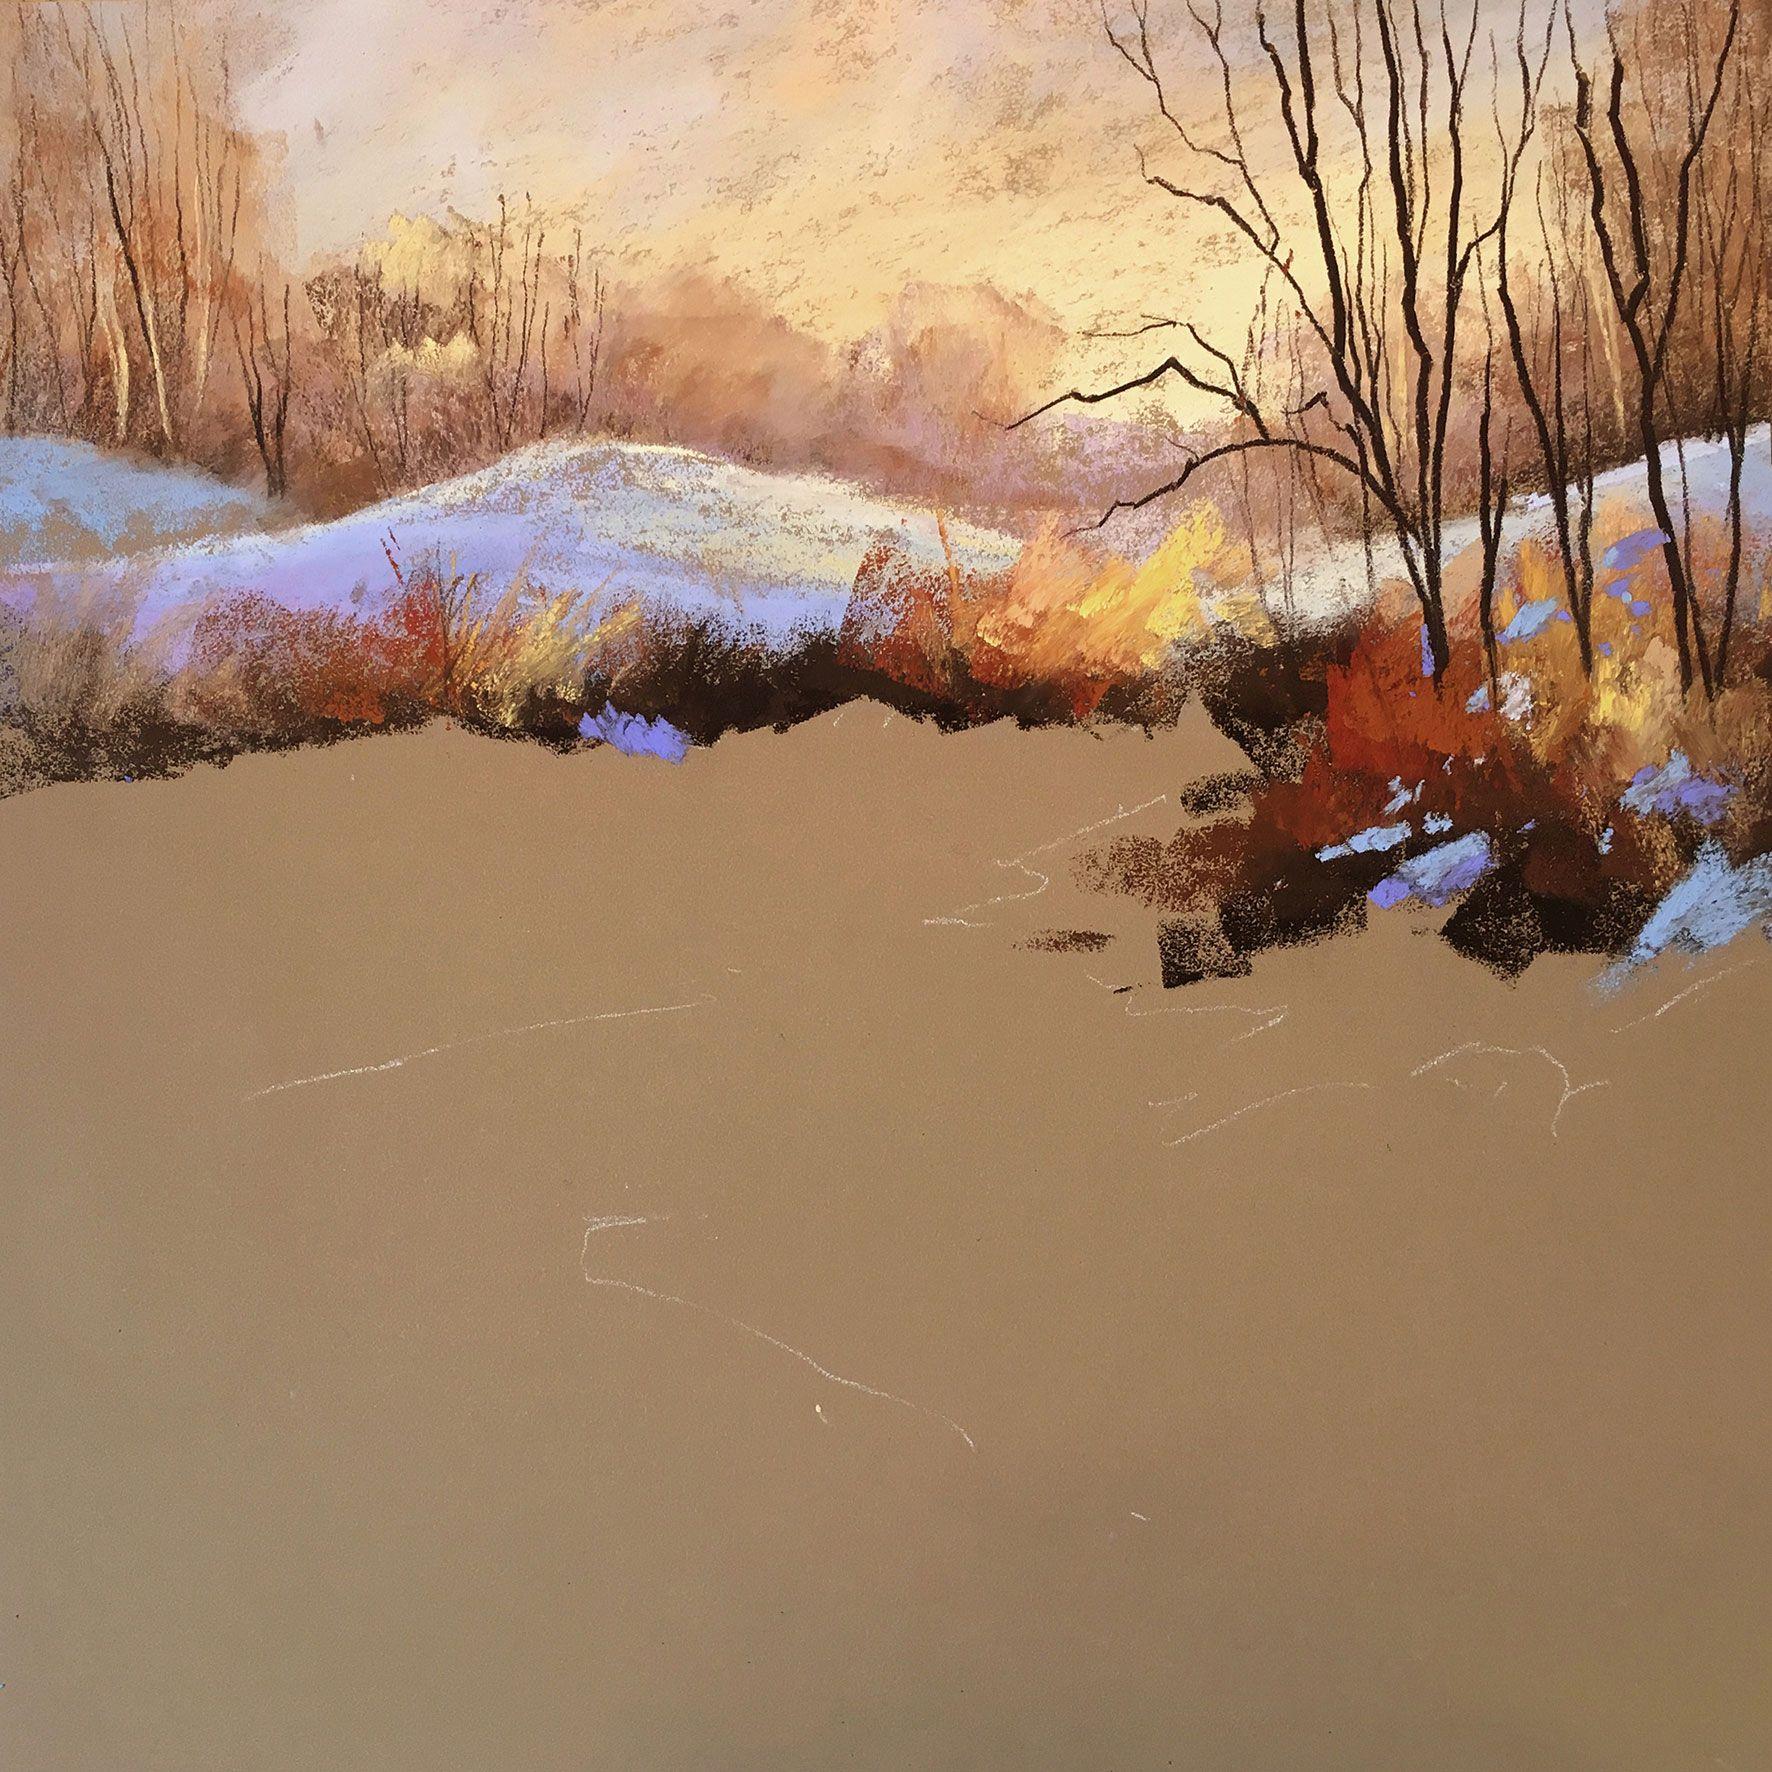 Landscape Painting With Les Darlow And Schmincke Soft Pastels Pastel